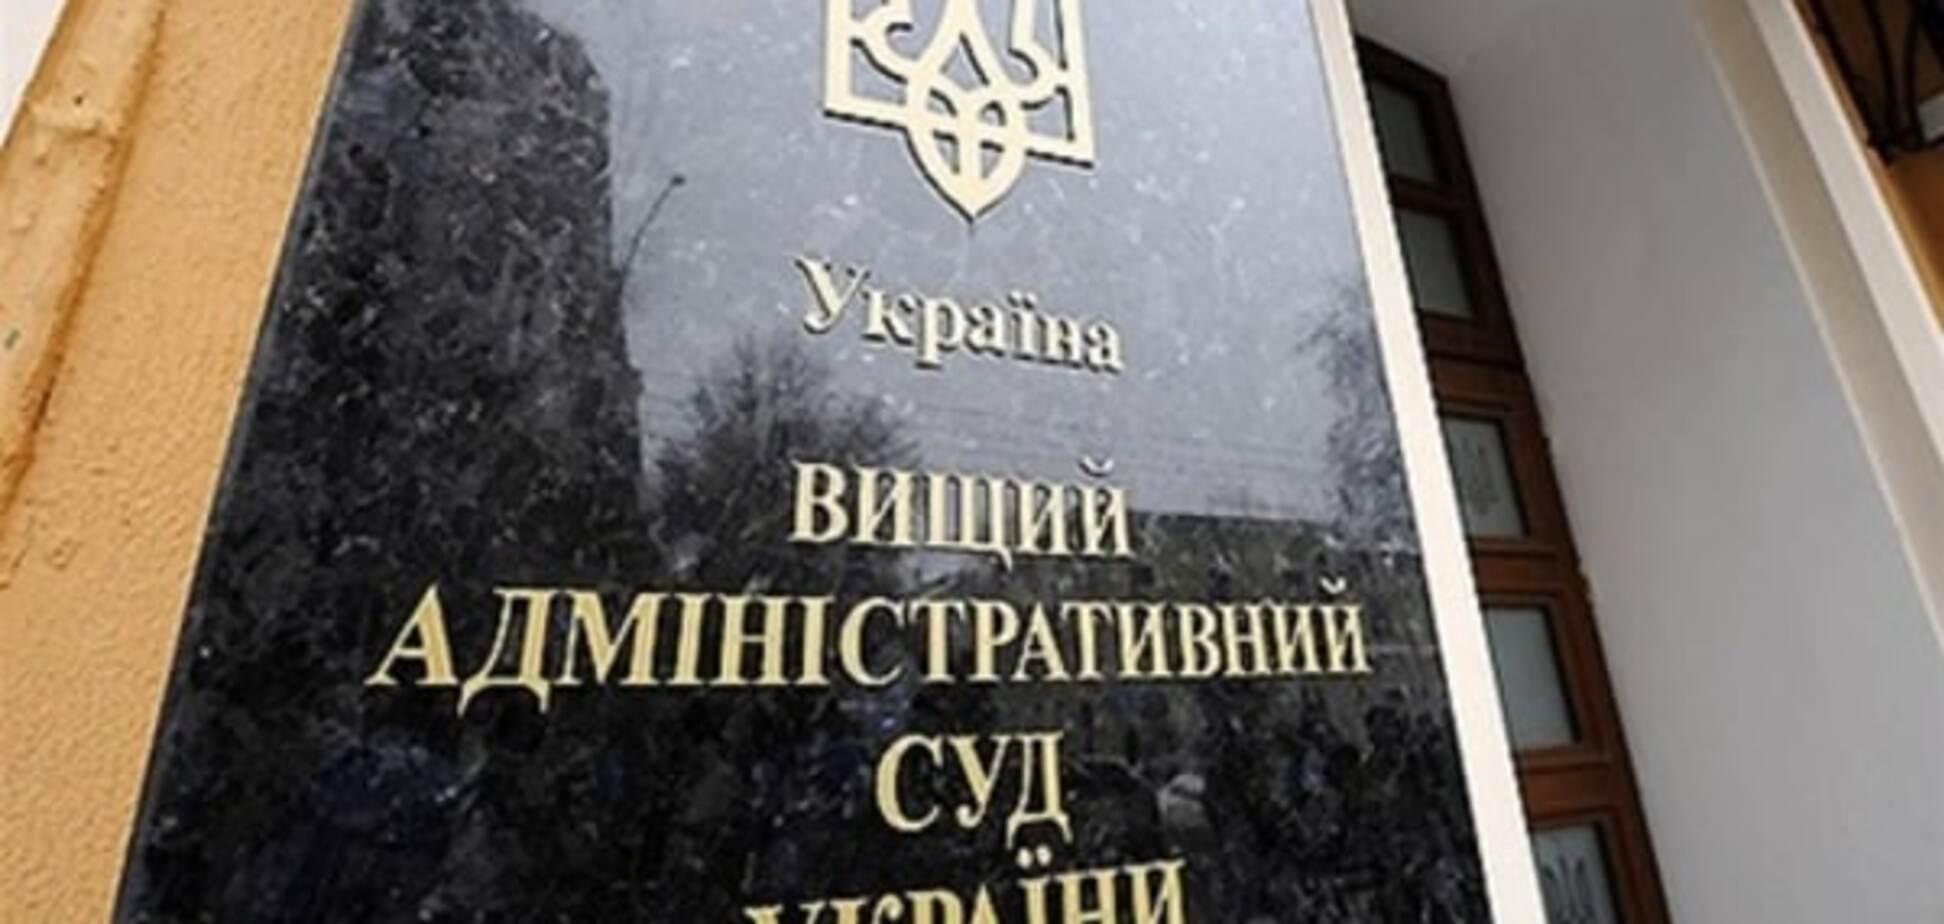 В ВАСУ заявили, что Рада и Шокин при задержании Мосийчука нарушили регламент